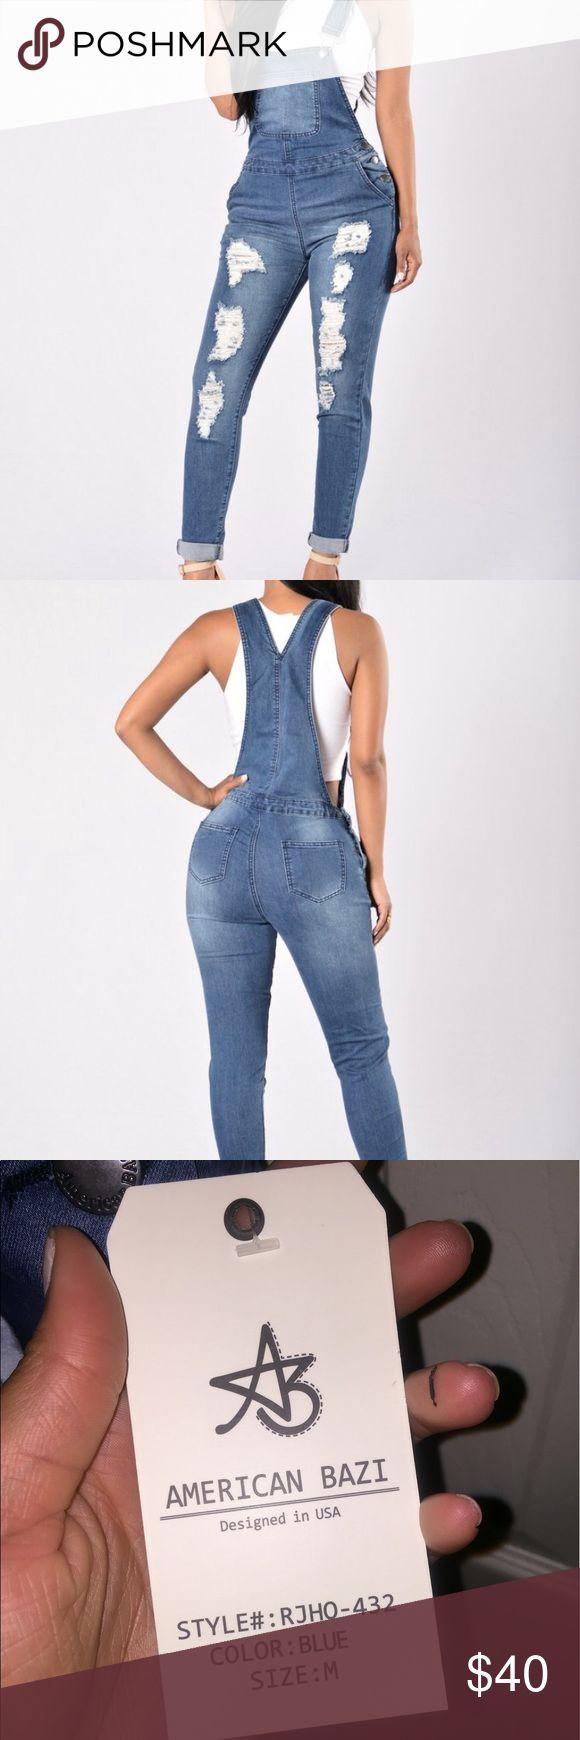 American Bazi Jean Jumpsuit Never worn! Super cute and stretchy denim jumpsuit. 5 pocket design, straight leg, 97% cotton 3% spandex. American Bazi Pants Jumpsuits & Rompers